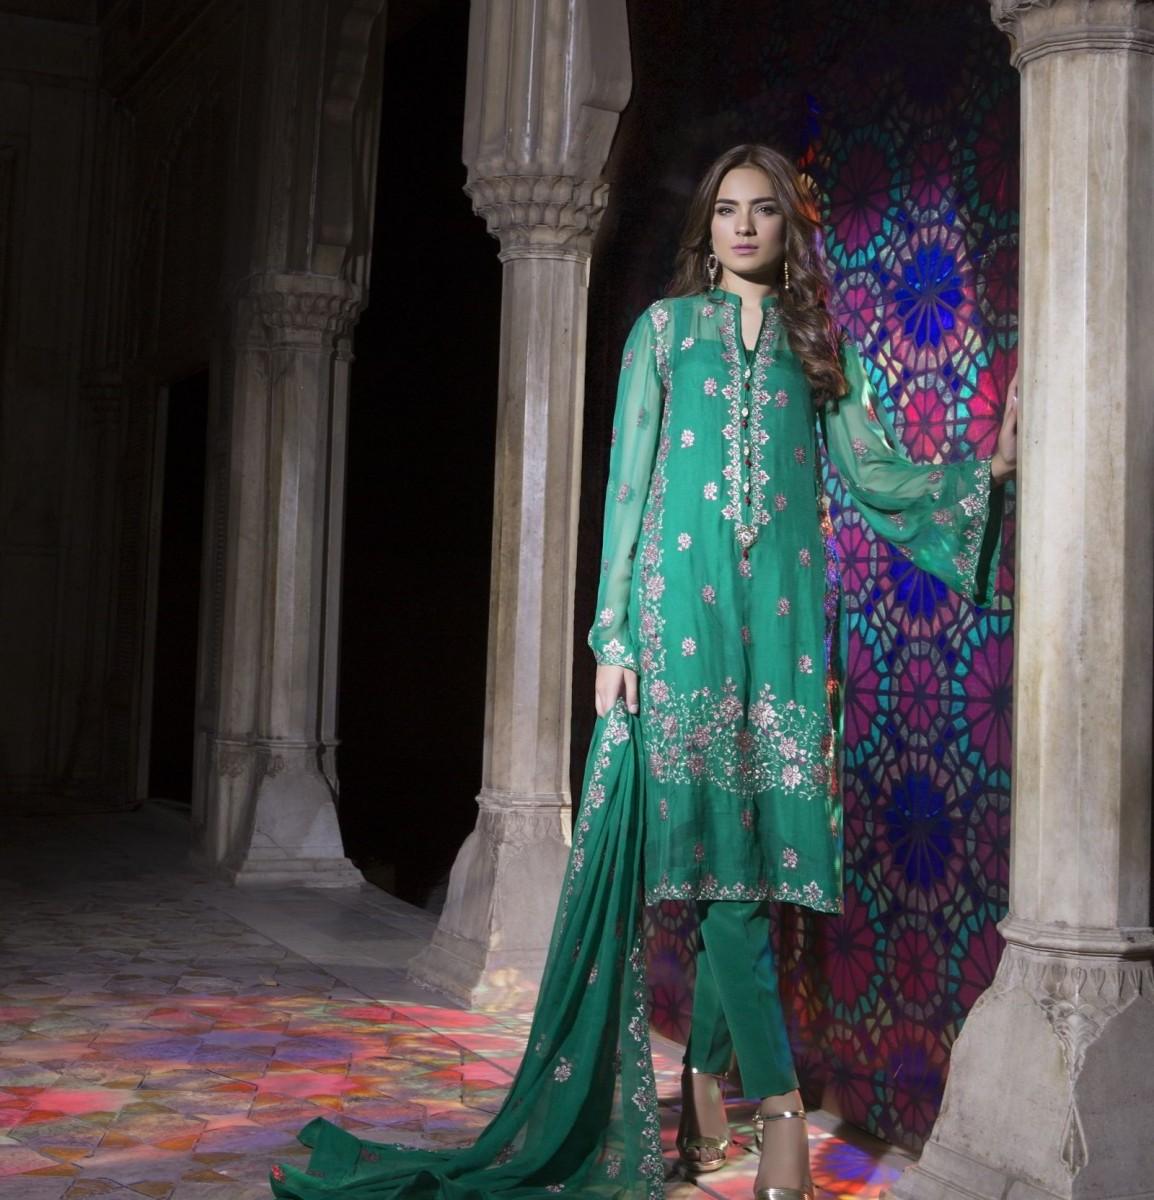 Dark Green Chiffon Self Mughal Maharani Eid Dress by Bareeze